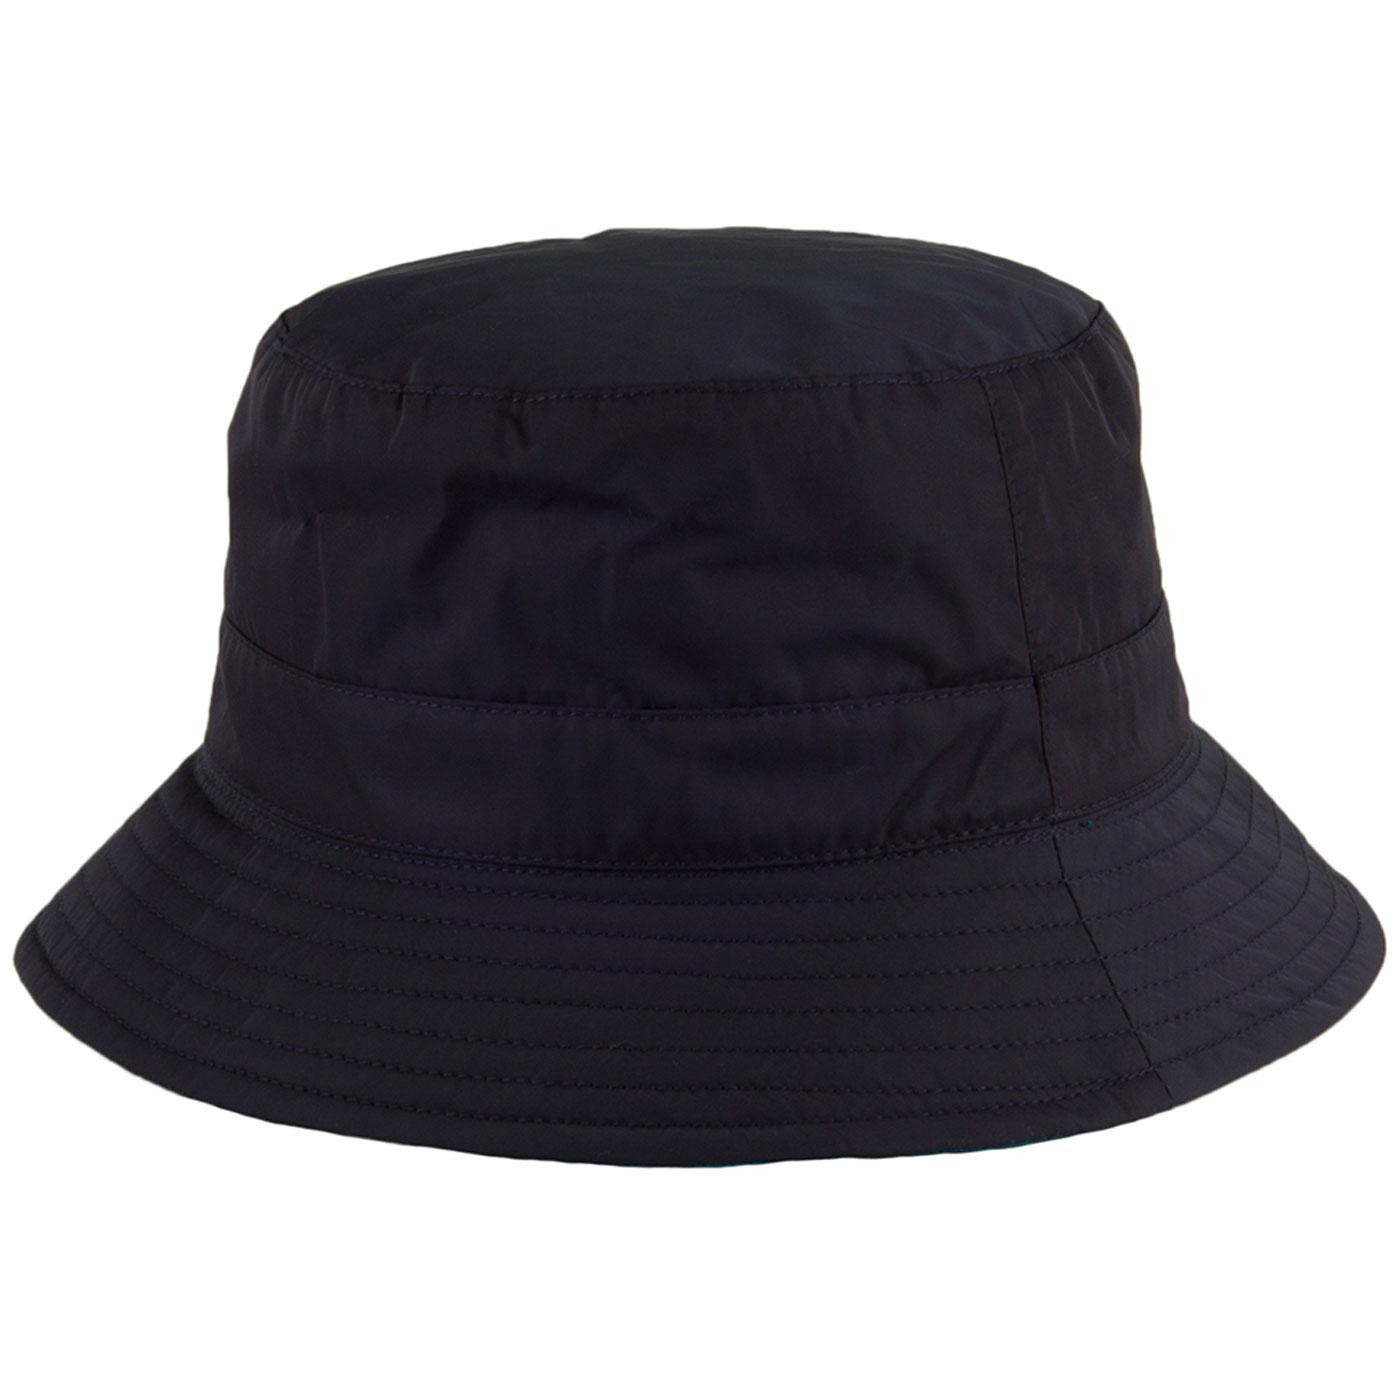 56babd8d69ddb FAILSWORTH Showerproof Reversible Bucket Hat Navy Teal